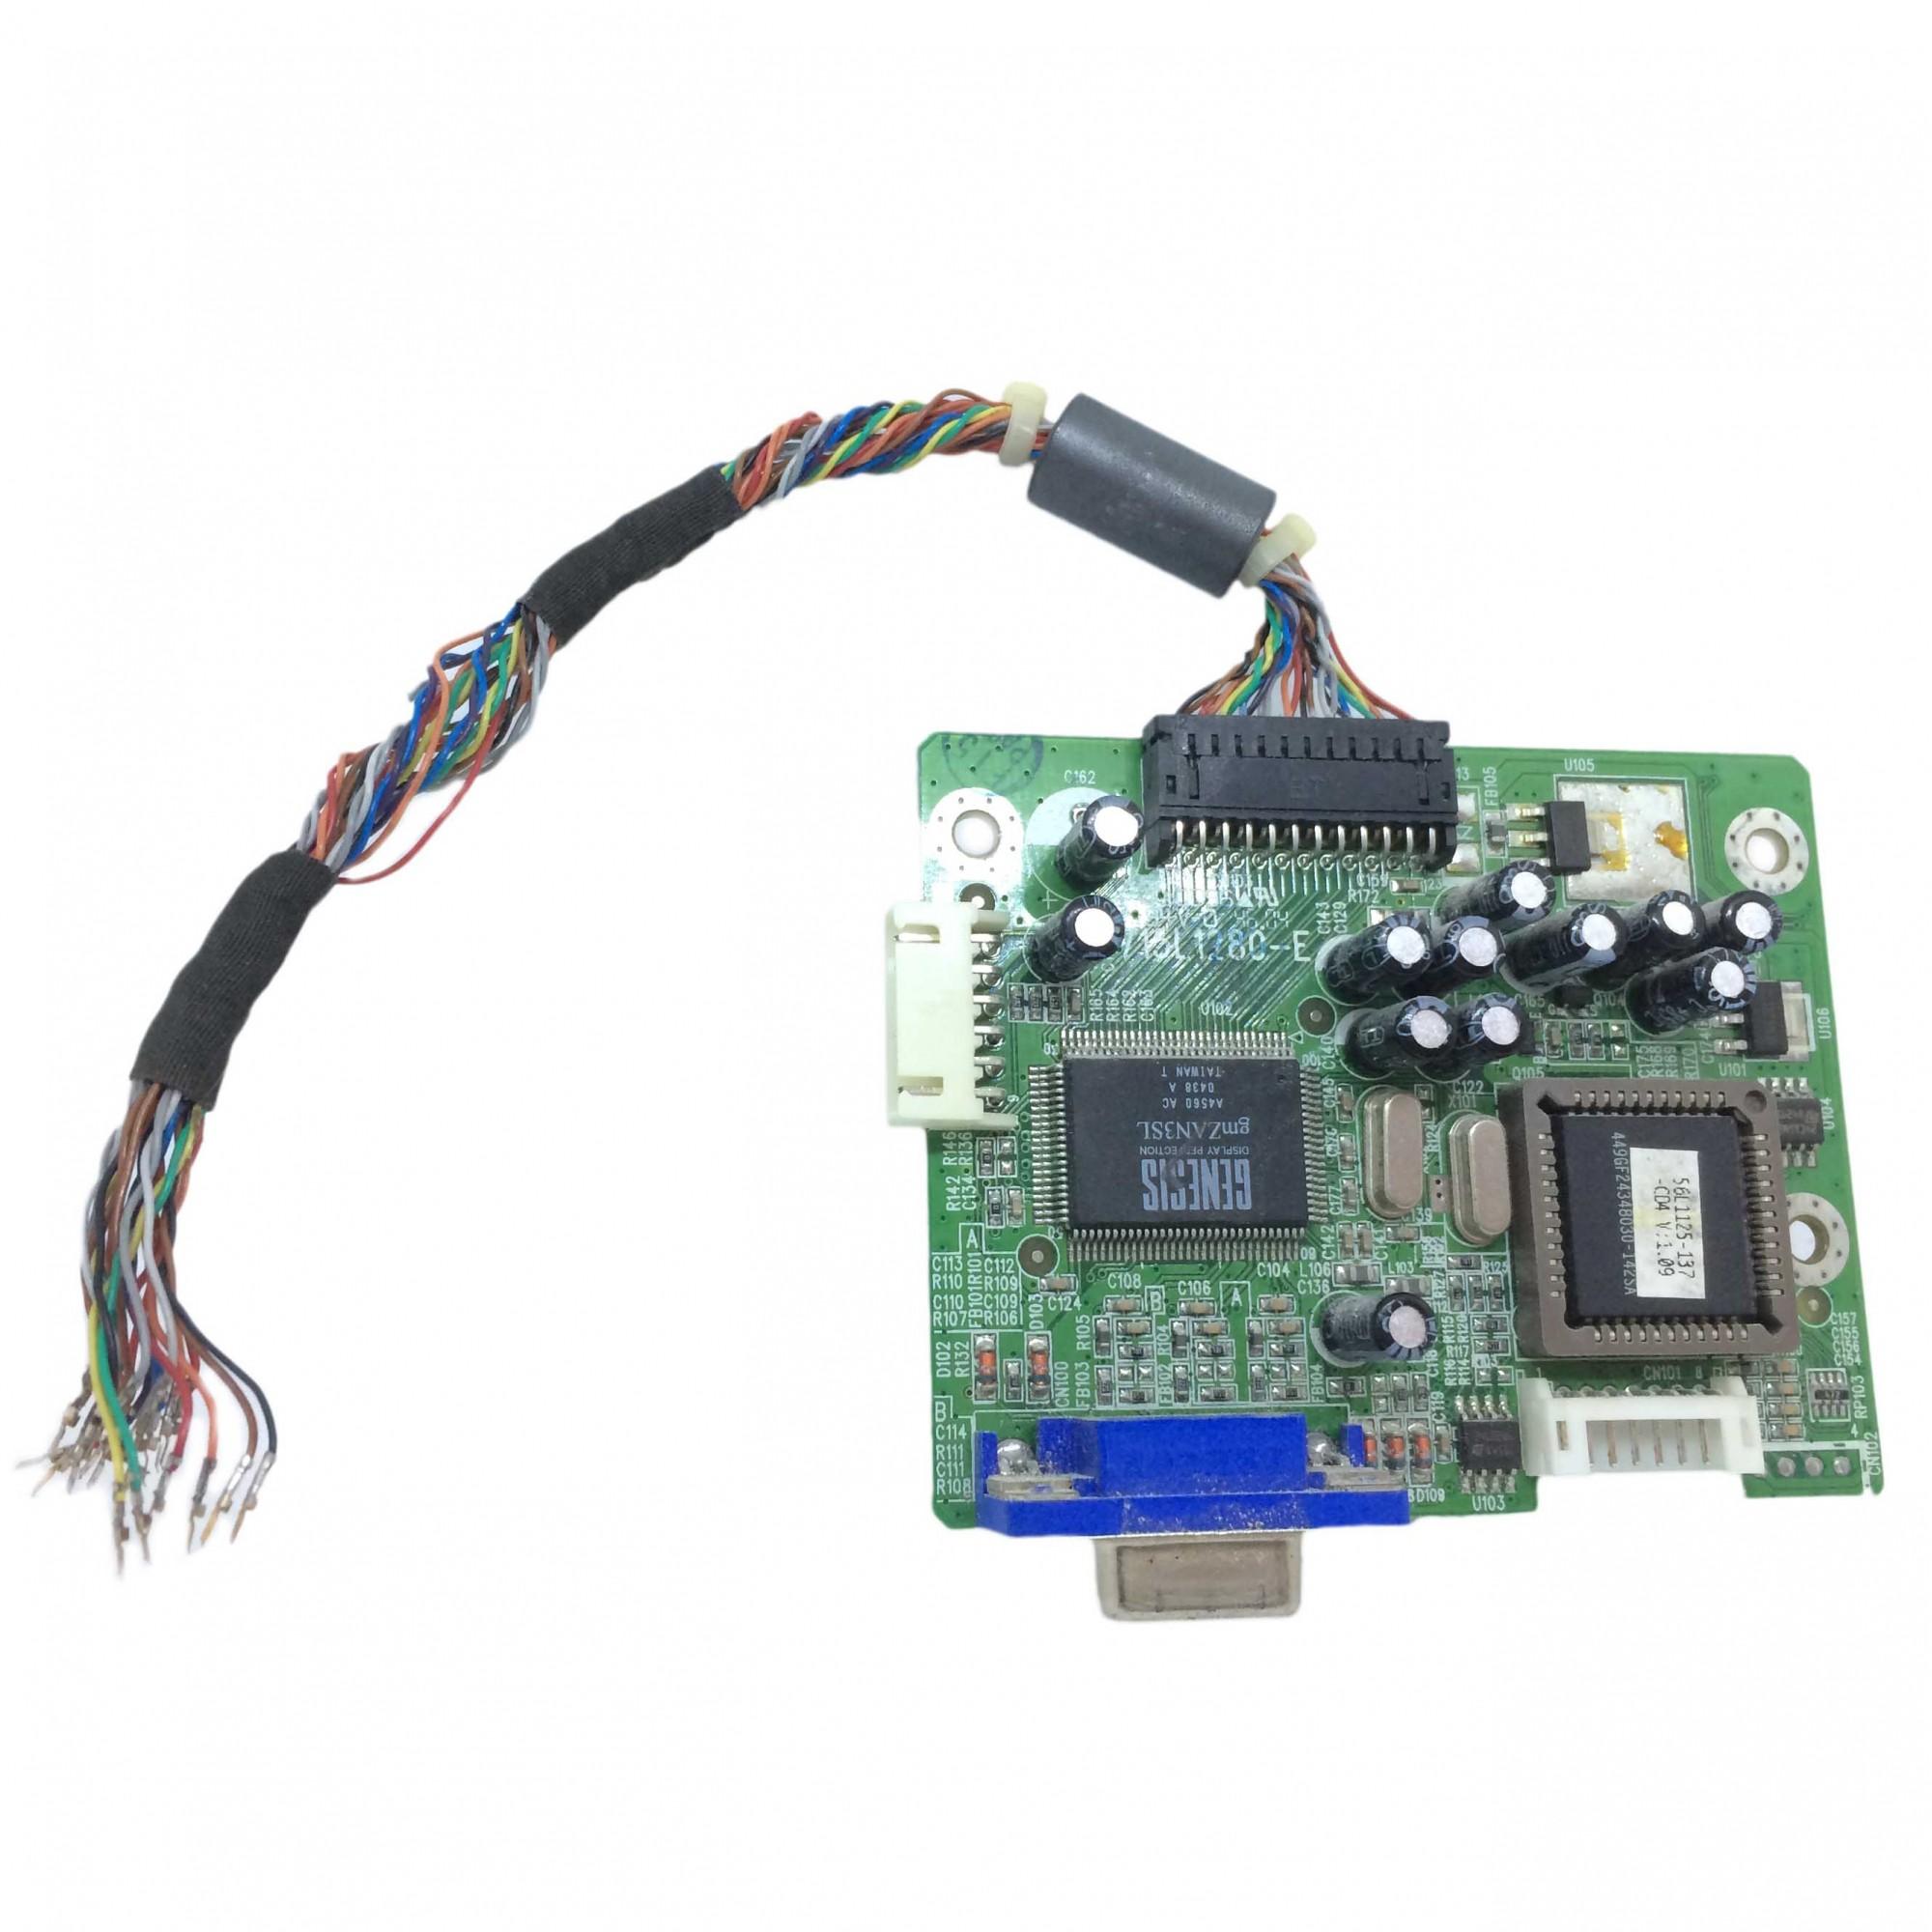 Placa Lógica Monitor + Cabo Flat (sem conector) Dell E153fpc PN:715l1280-e - Retirado